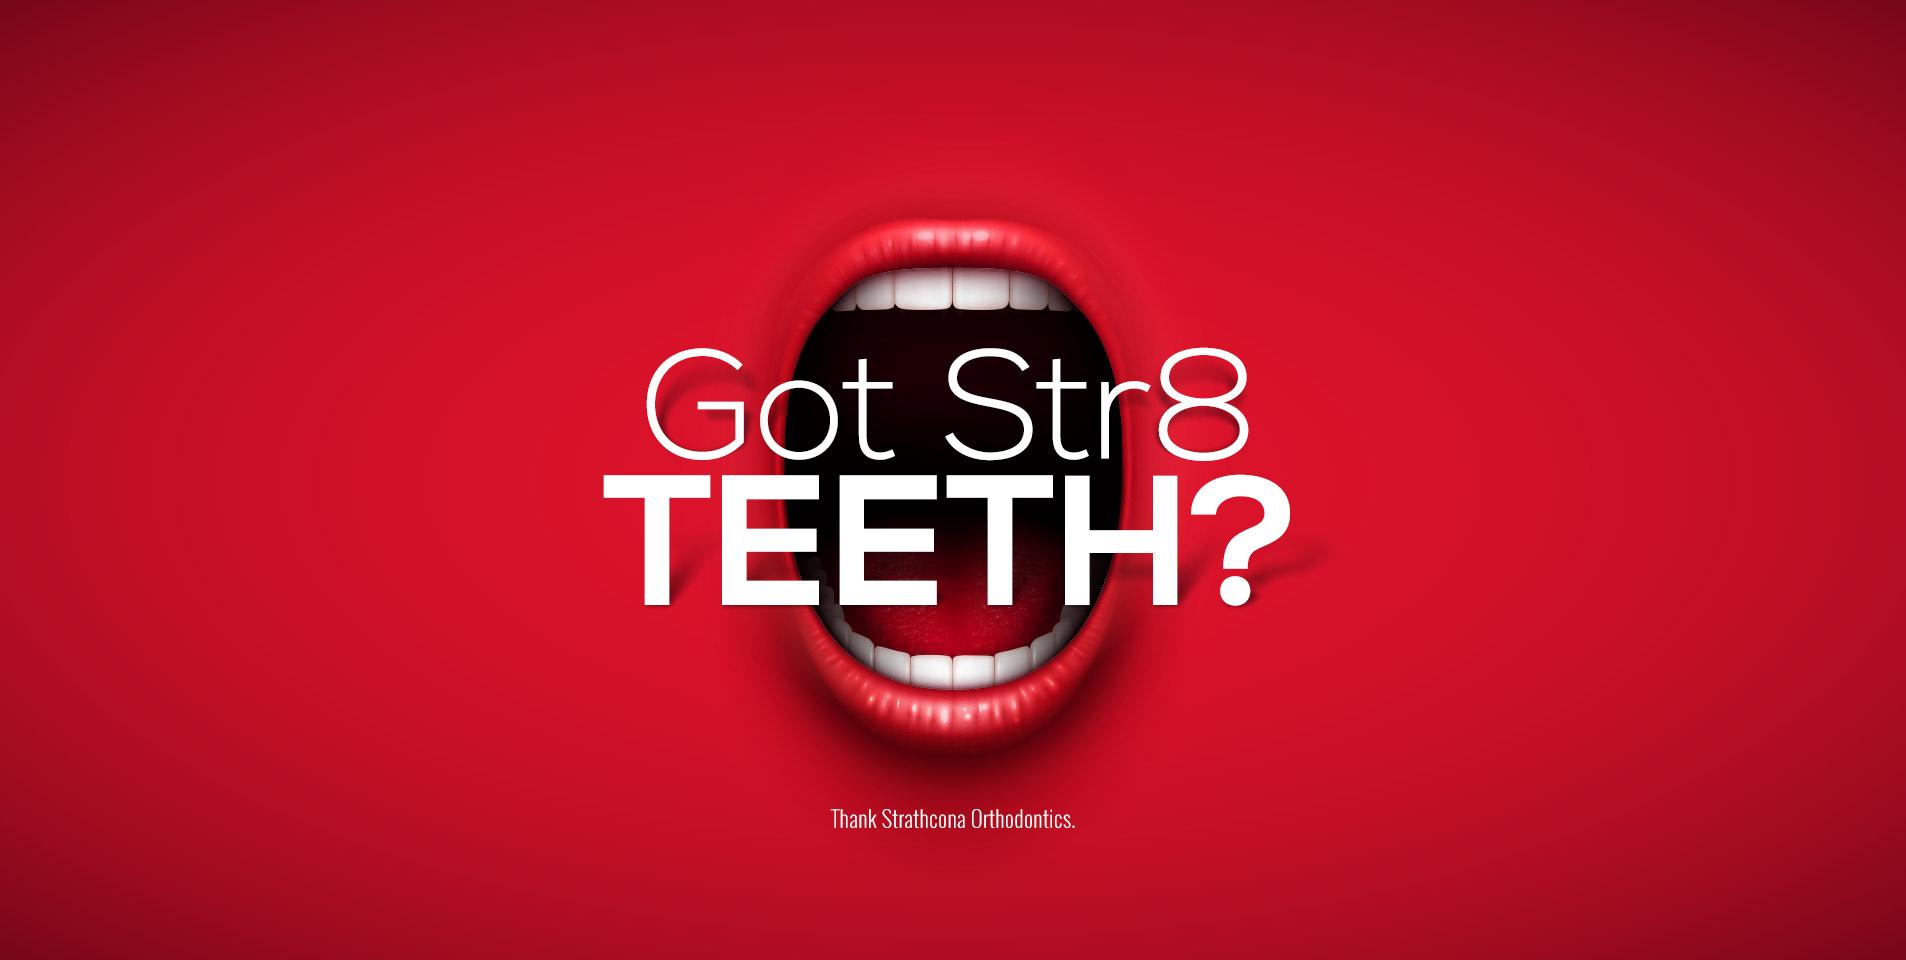 Strathcona Orthodontics